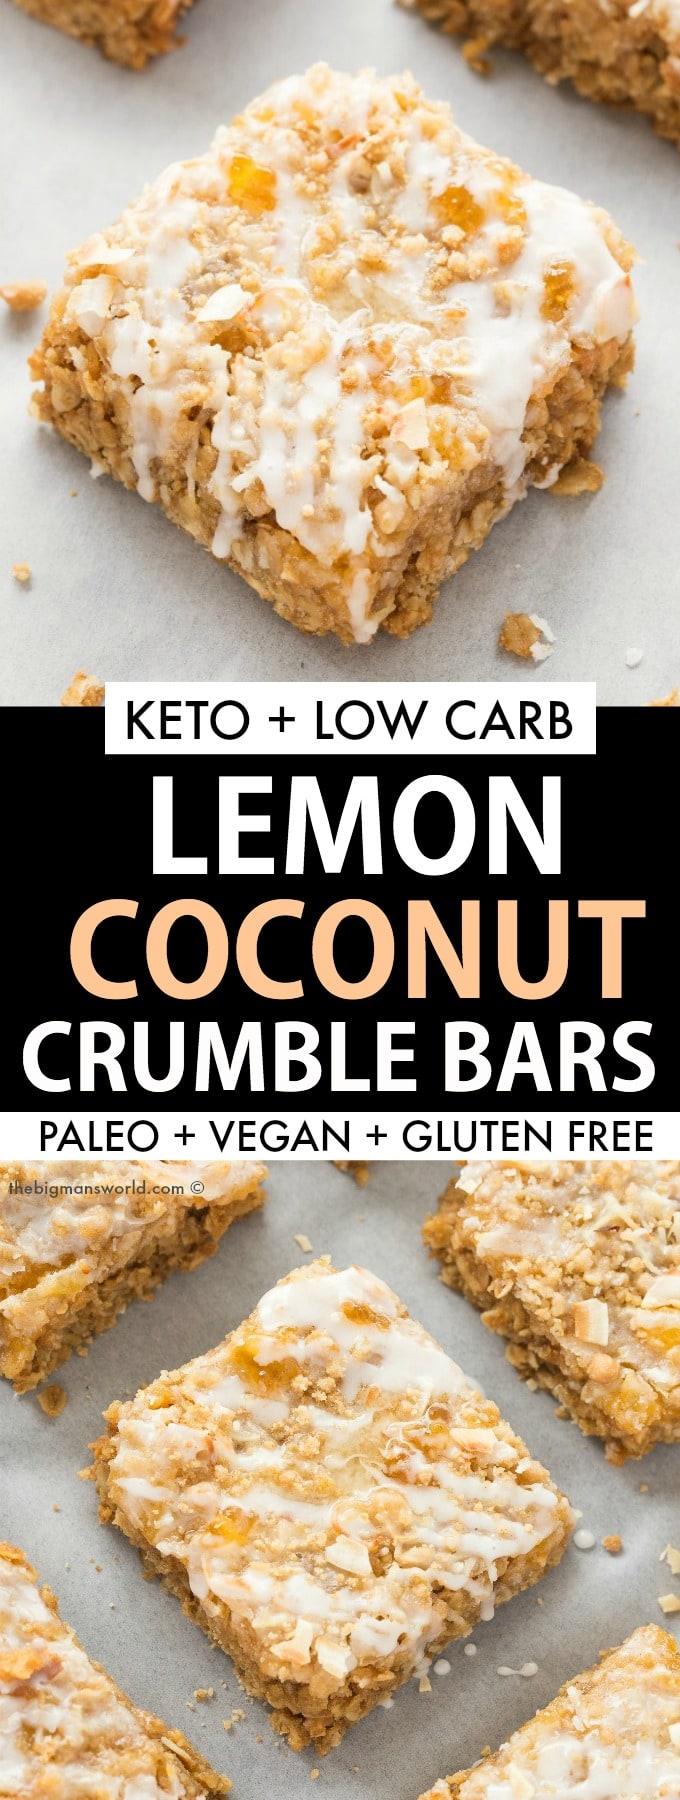 Keto Lemon Coconut Bars Recipe- Paleo and vegan friendly!